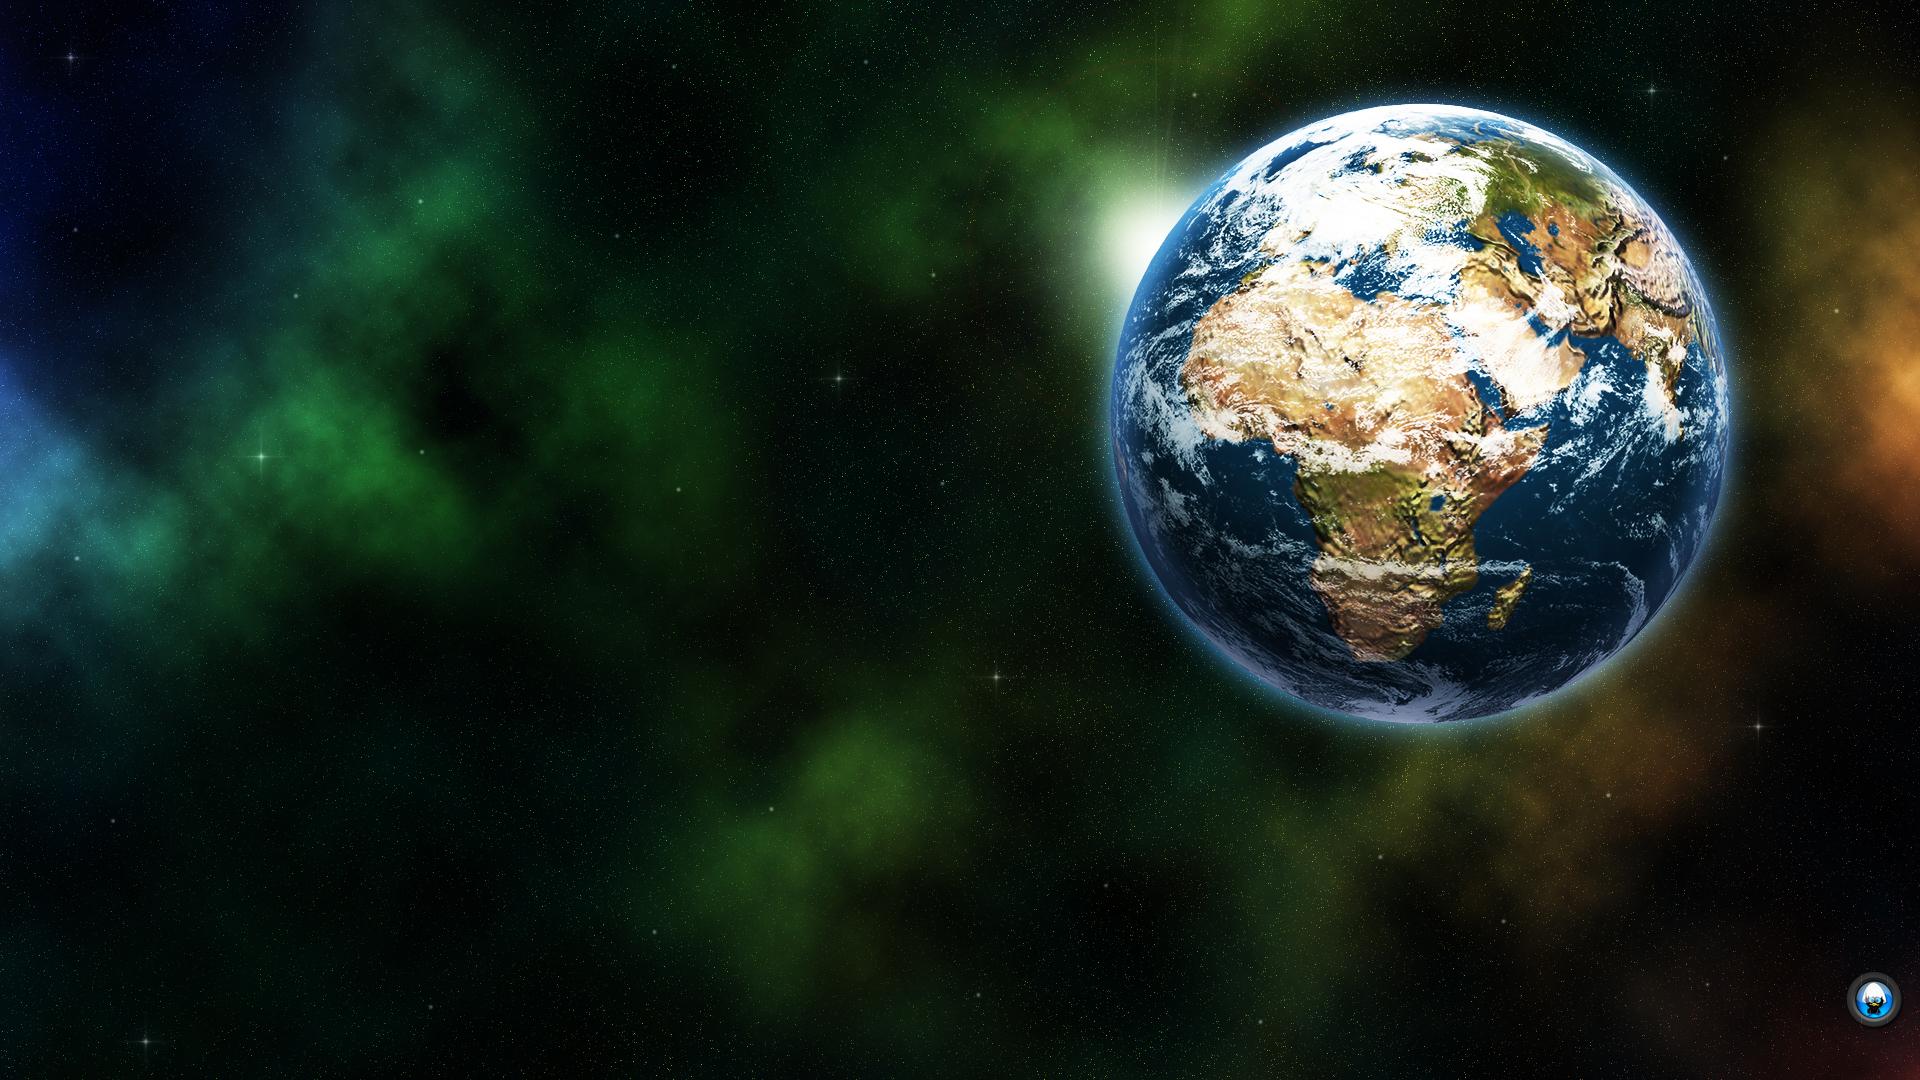 planets nature 1920x1080 - photo #20